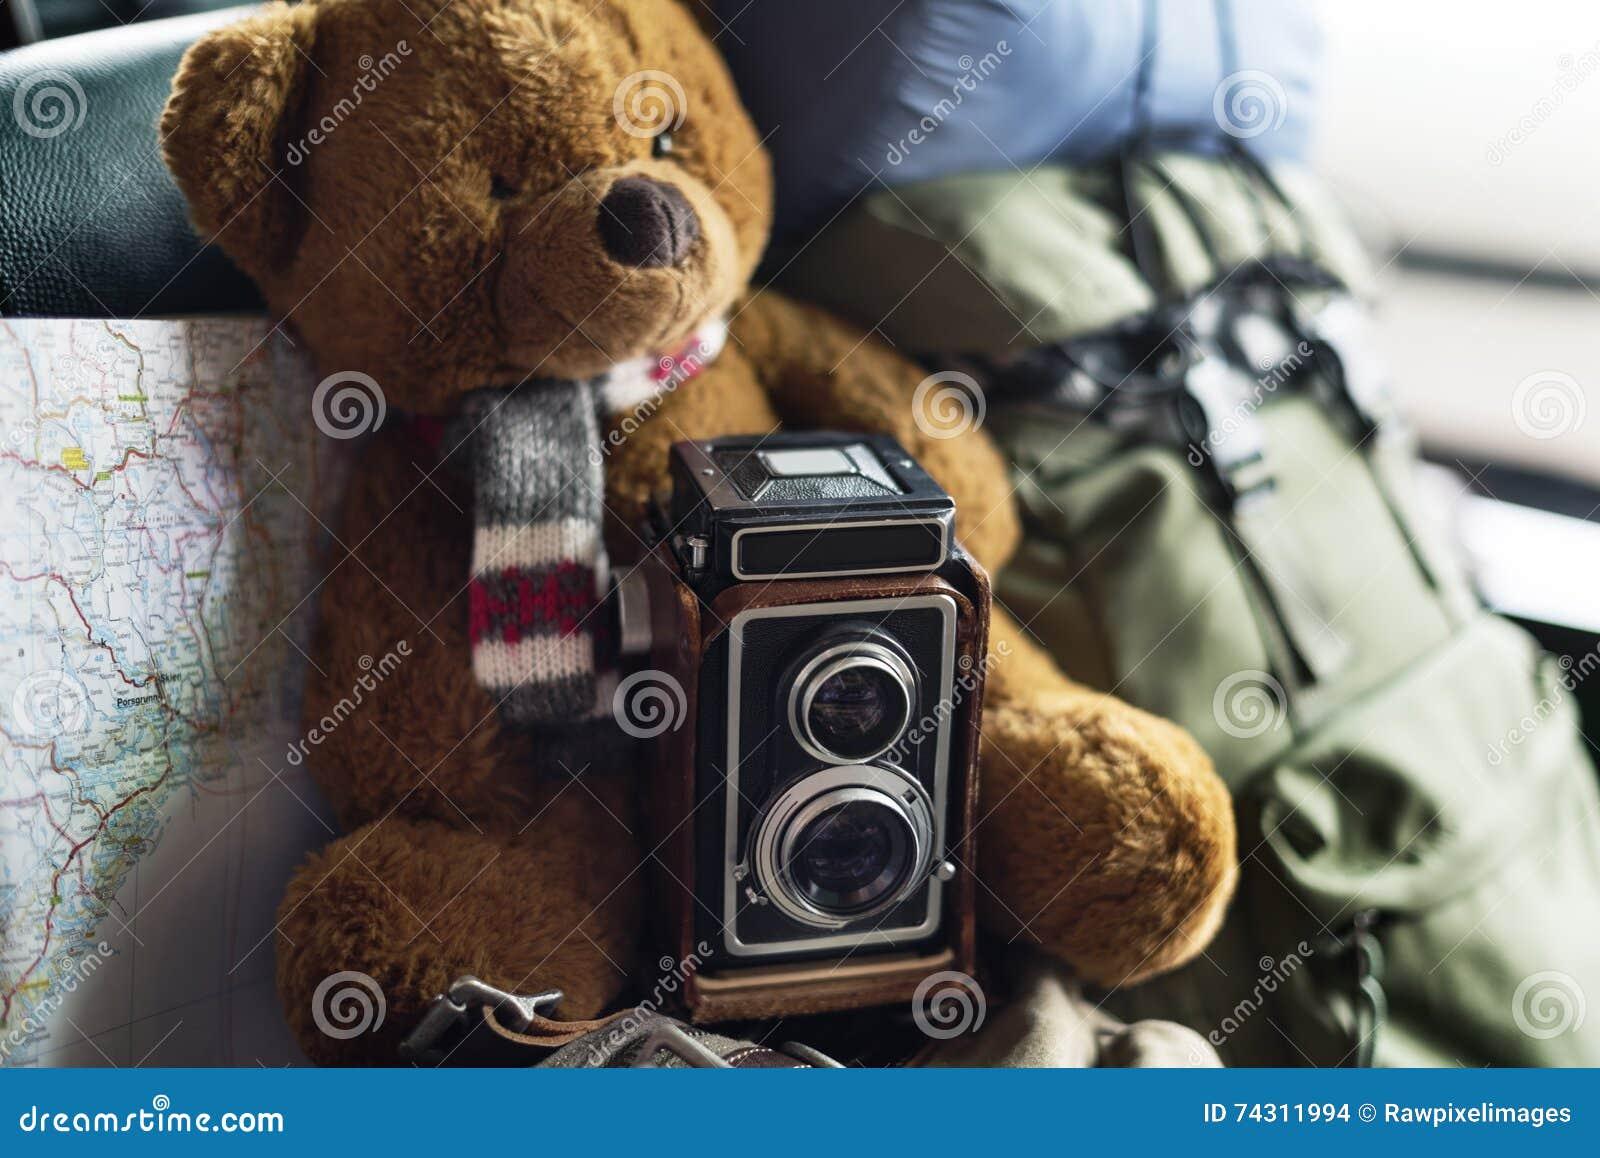 Kamera-Film-Fokus-Rahmen-Foto-Fotografie-Ansicht-Konzept Stockfoto ...